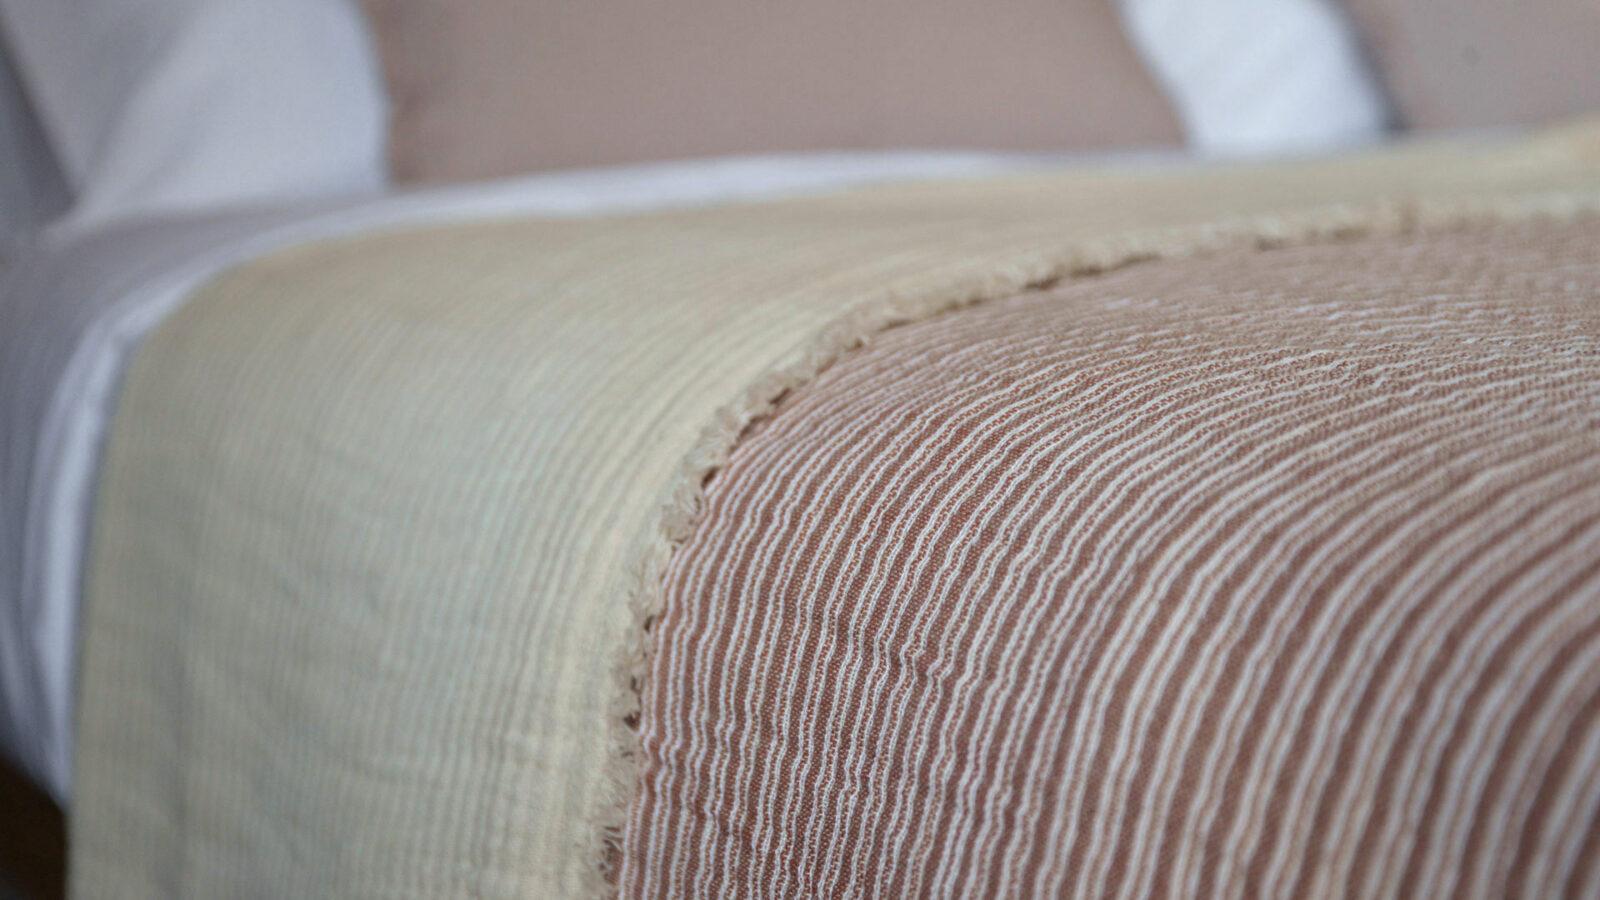 Reversible cotton bedspread pink striped one side plain cream reverse